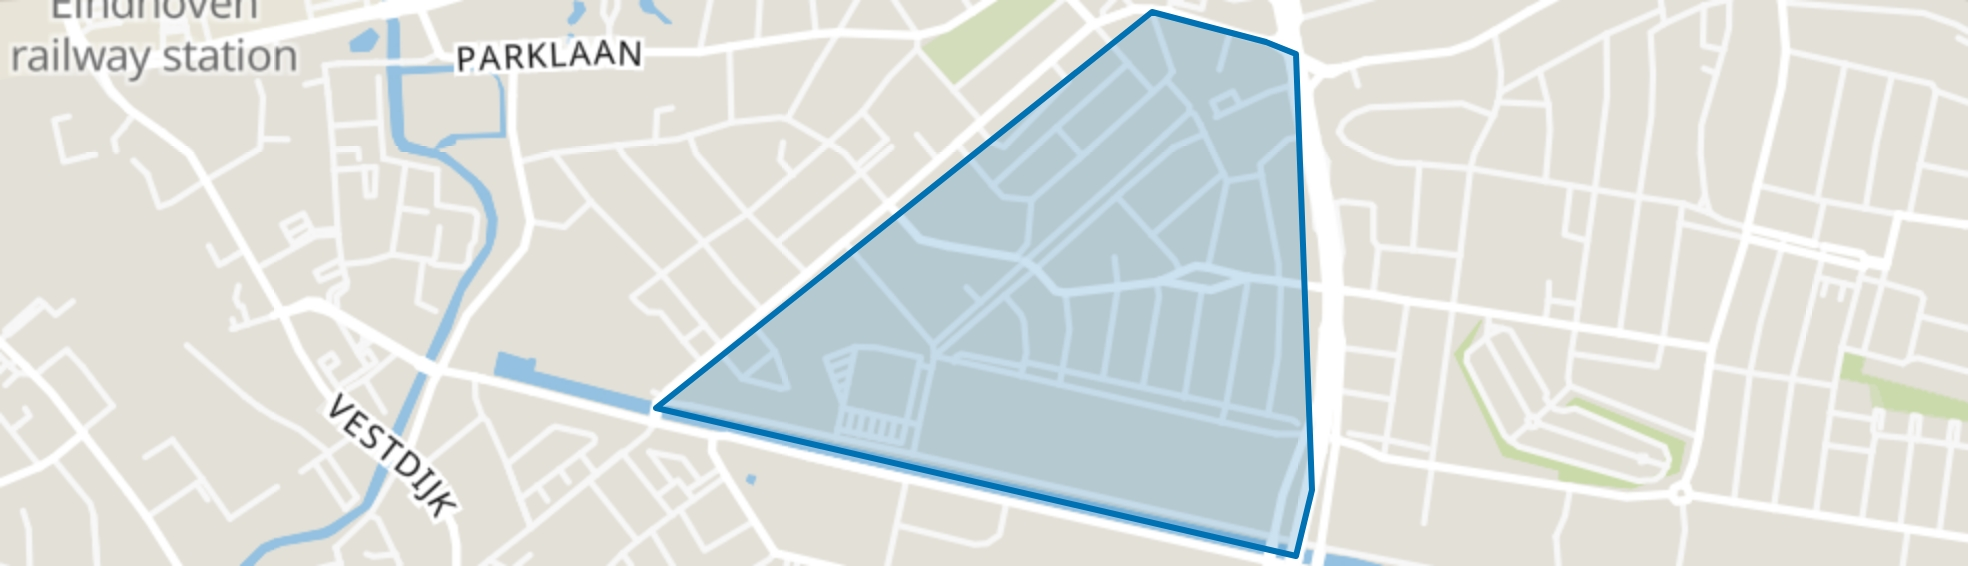 Lakerlopen, Eindhoven map